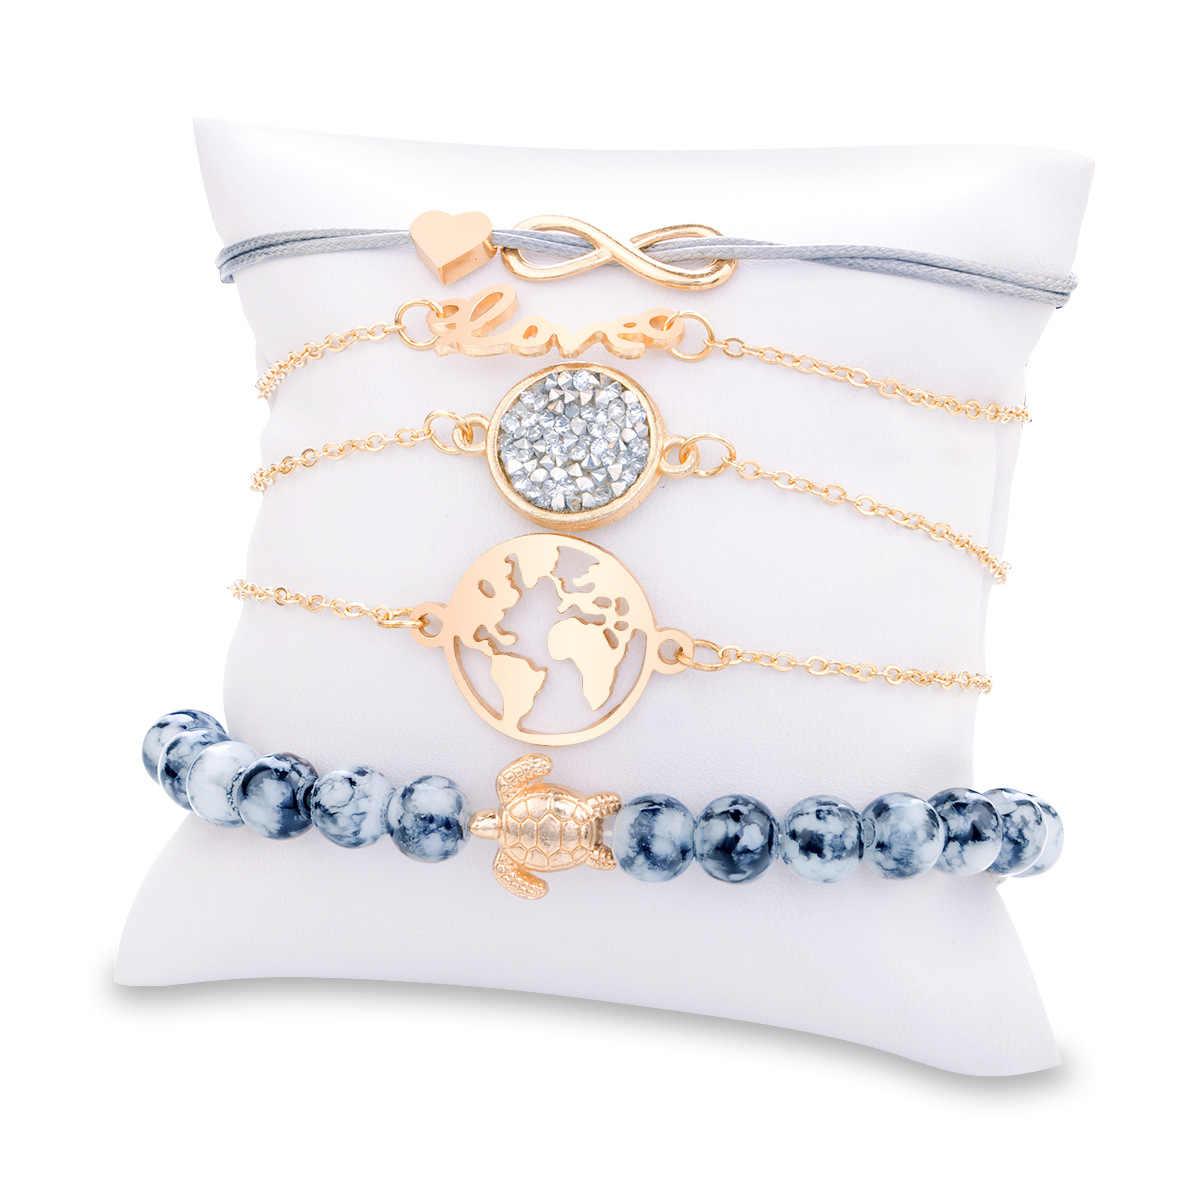 Gray Beads Bracelets Bohemian Creative World Map Turtle Love Heart Infinity Charm Bracelets Set Fashion Jewelry drop shipping